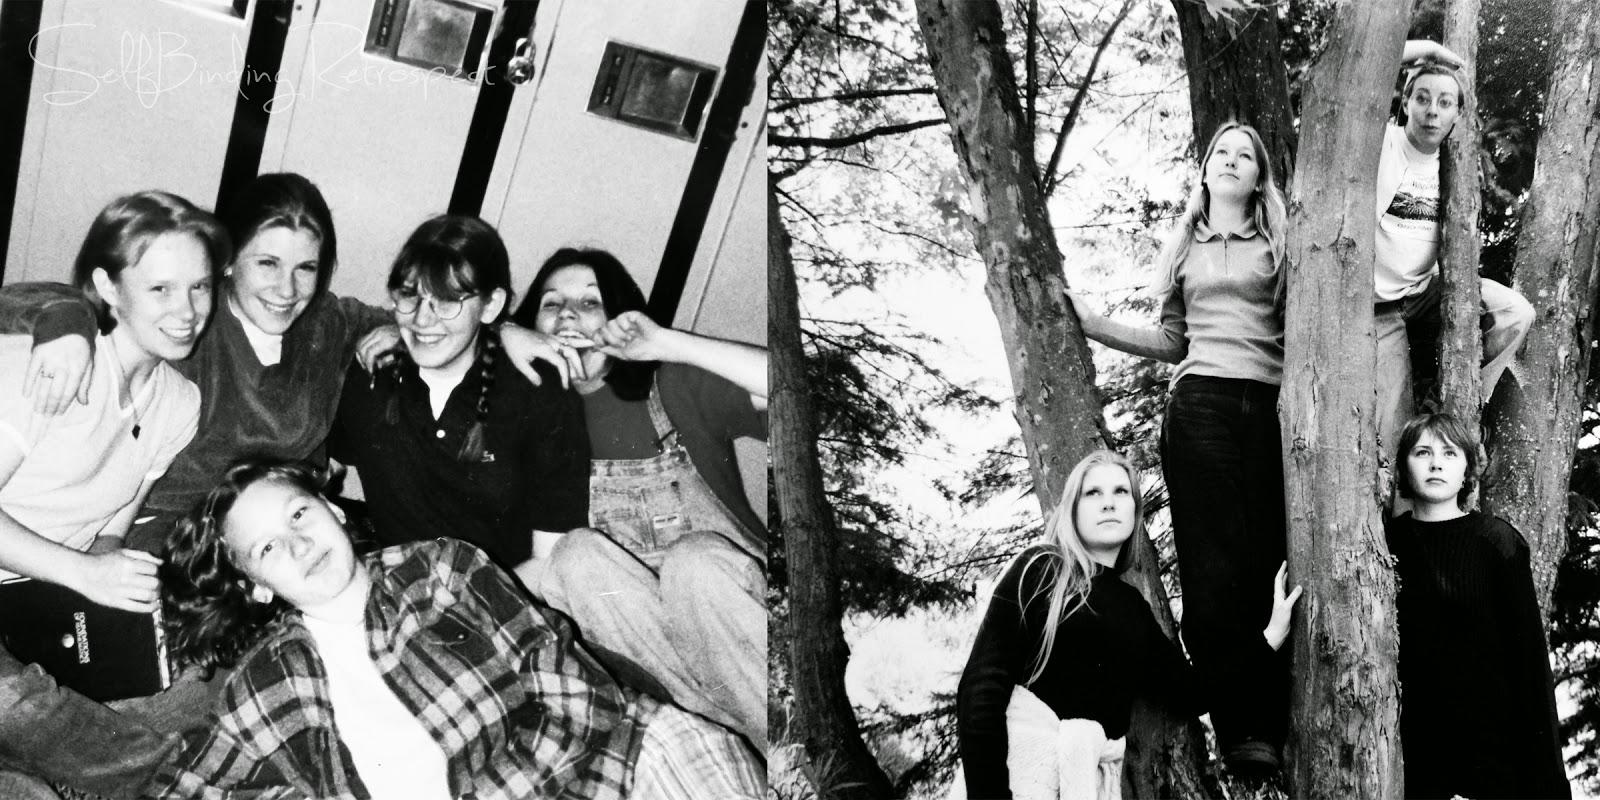 I want to go back to highschool - SelfBinding Retrospect by Alanna Rusnak